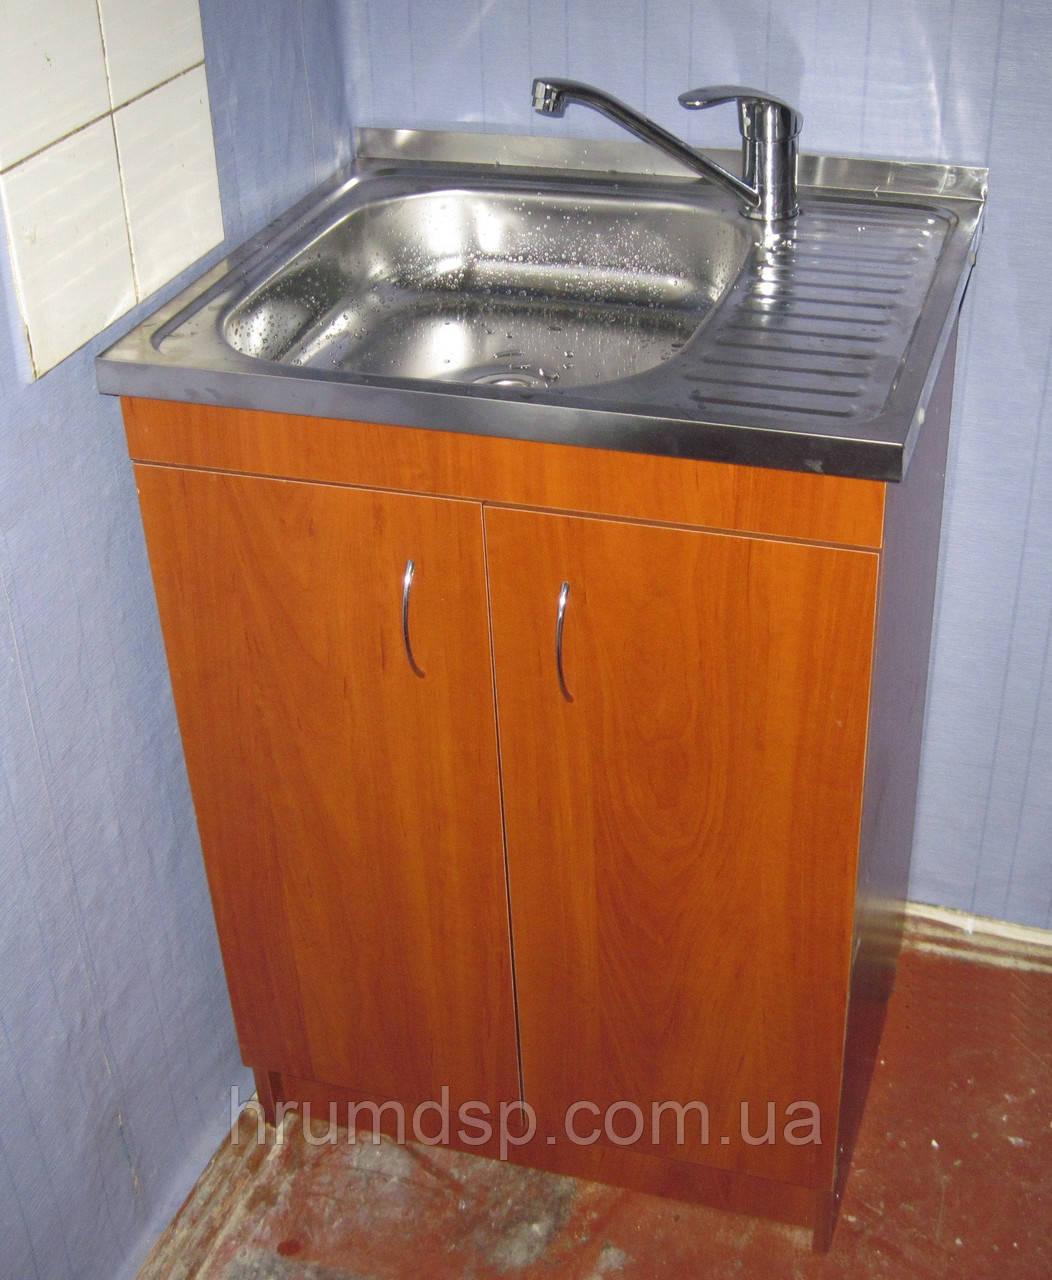 Мийка кухонна 60х50 з тумбою і кран HAIBA ZEON